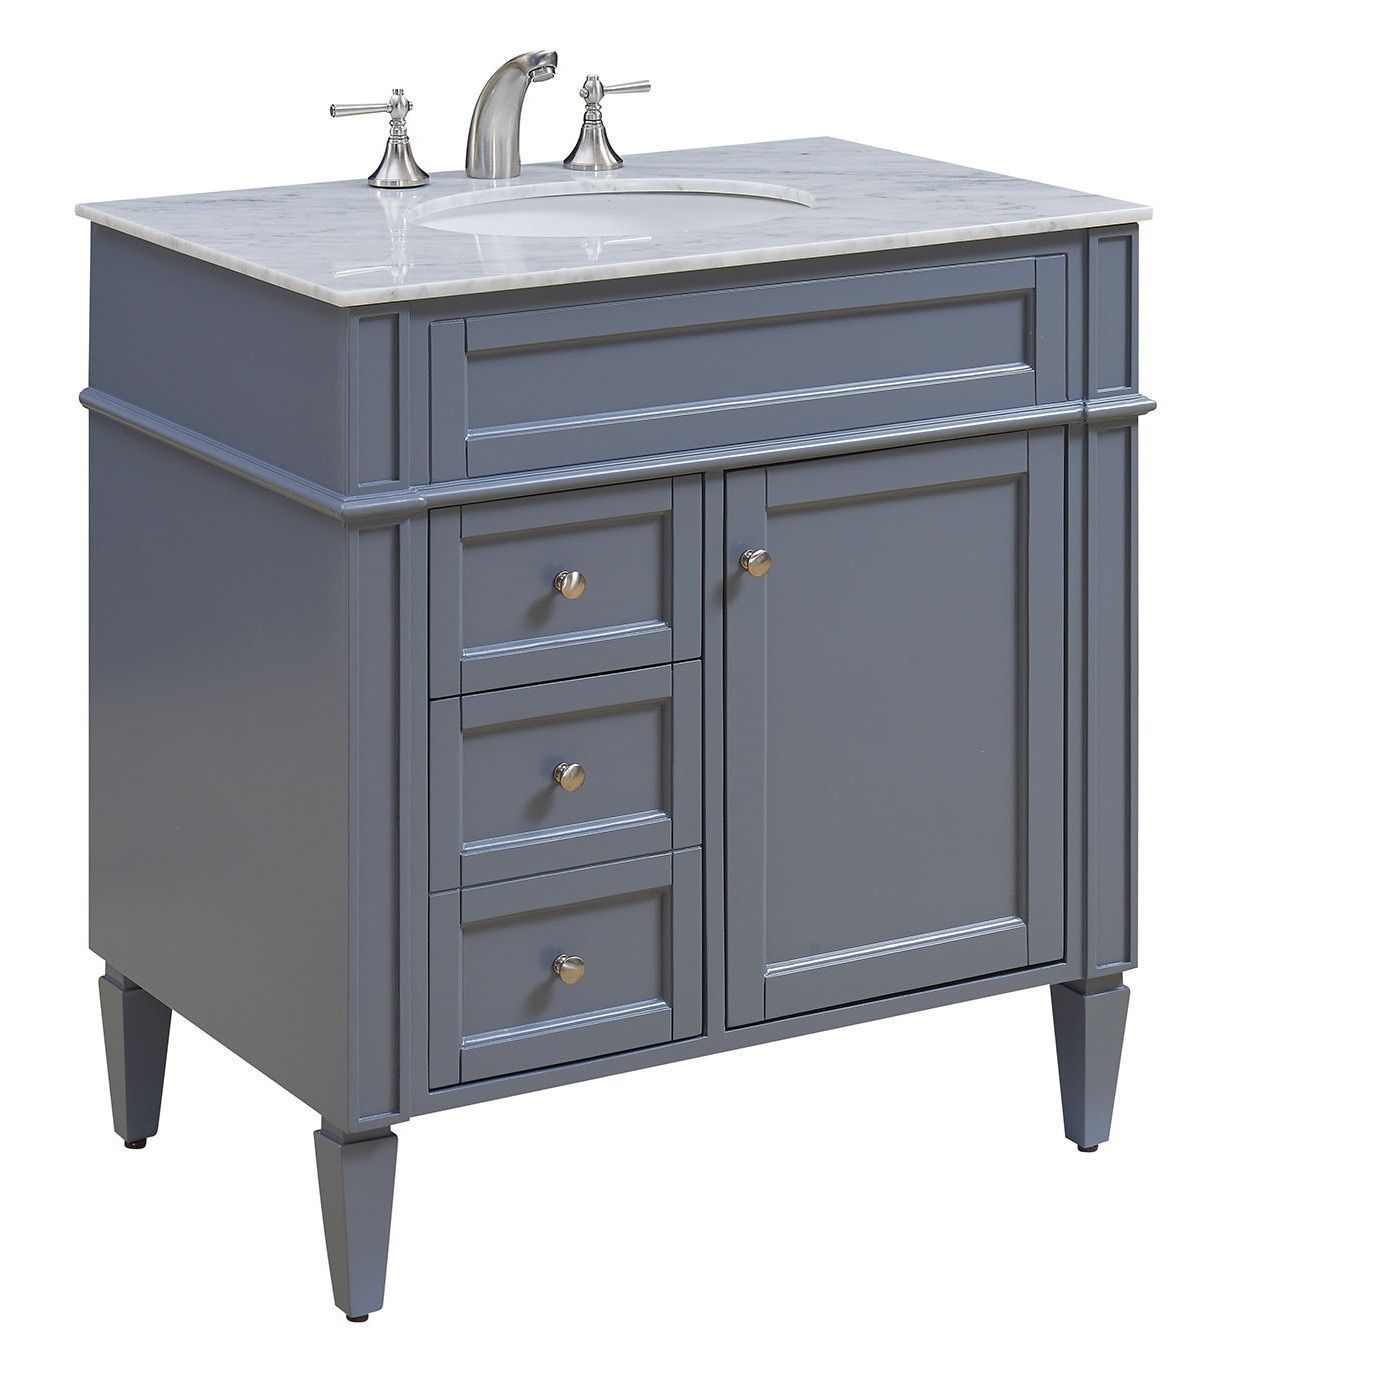 Somette 32 Madison Single Bathroom Vanity Set In Grey Grey Size Single Vanities 12inchspreadbathroomfaucet Single Bathroom Vanity Bathroom Vanity Vanity [ 1385 x 1385 Pixel ]